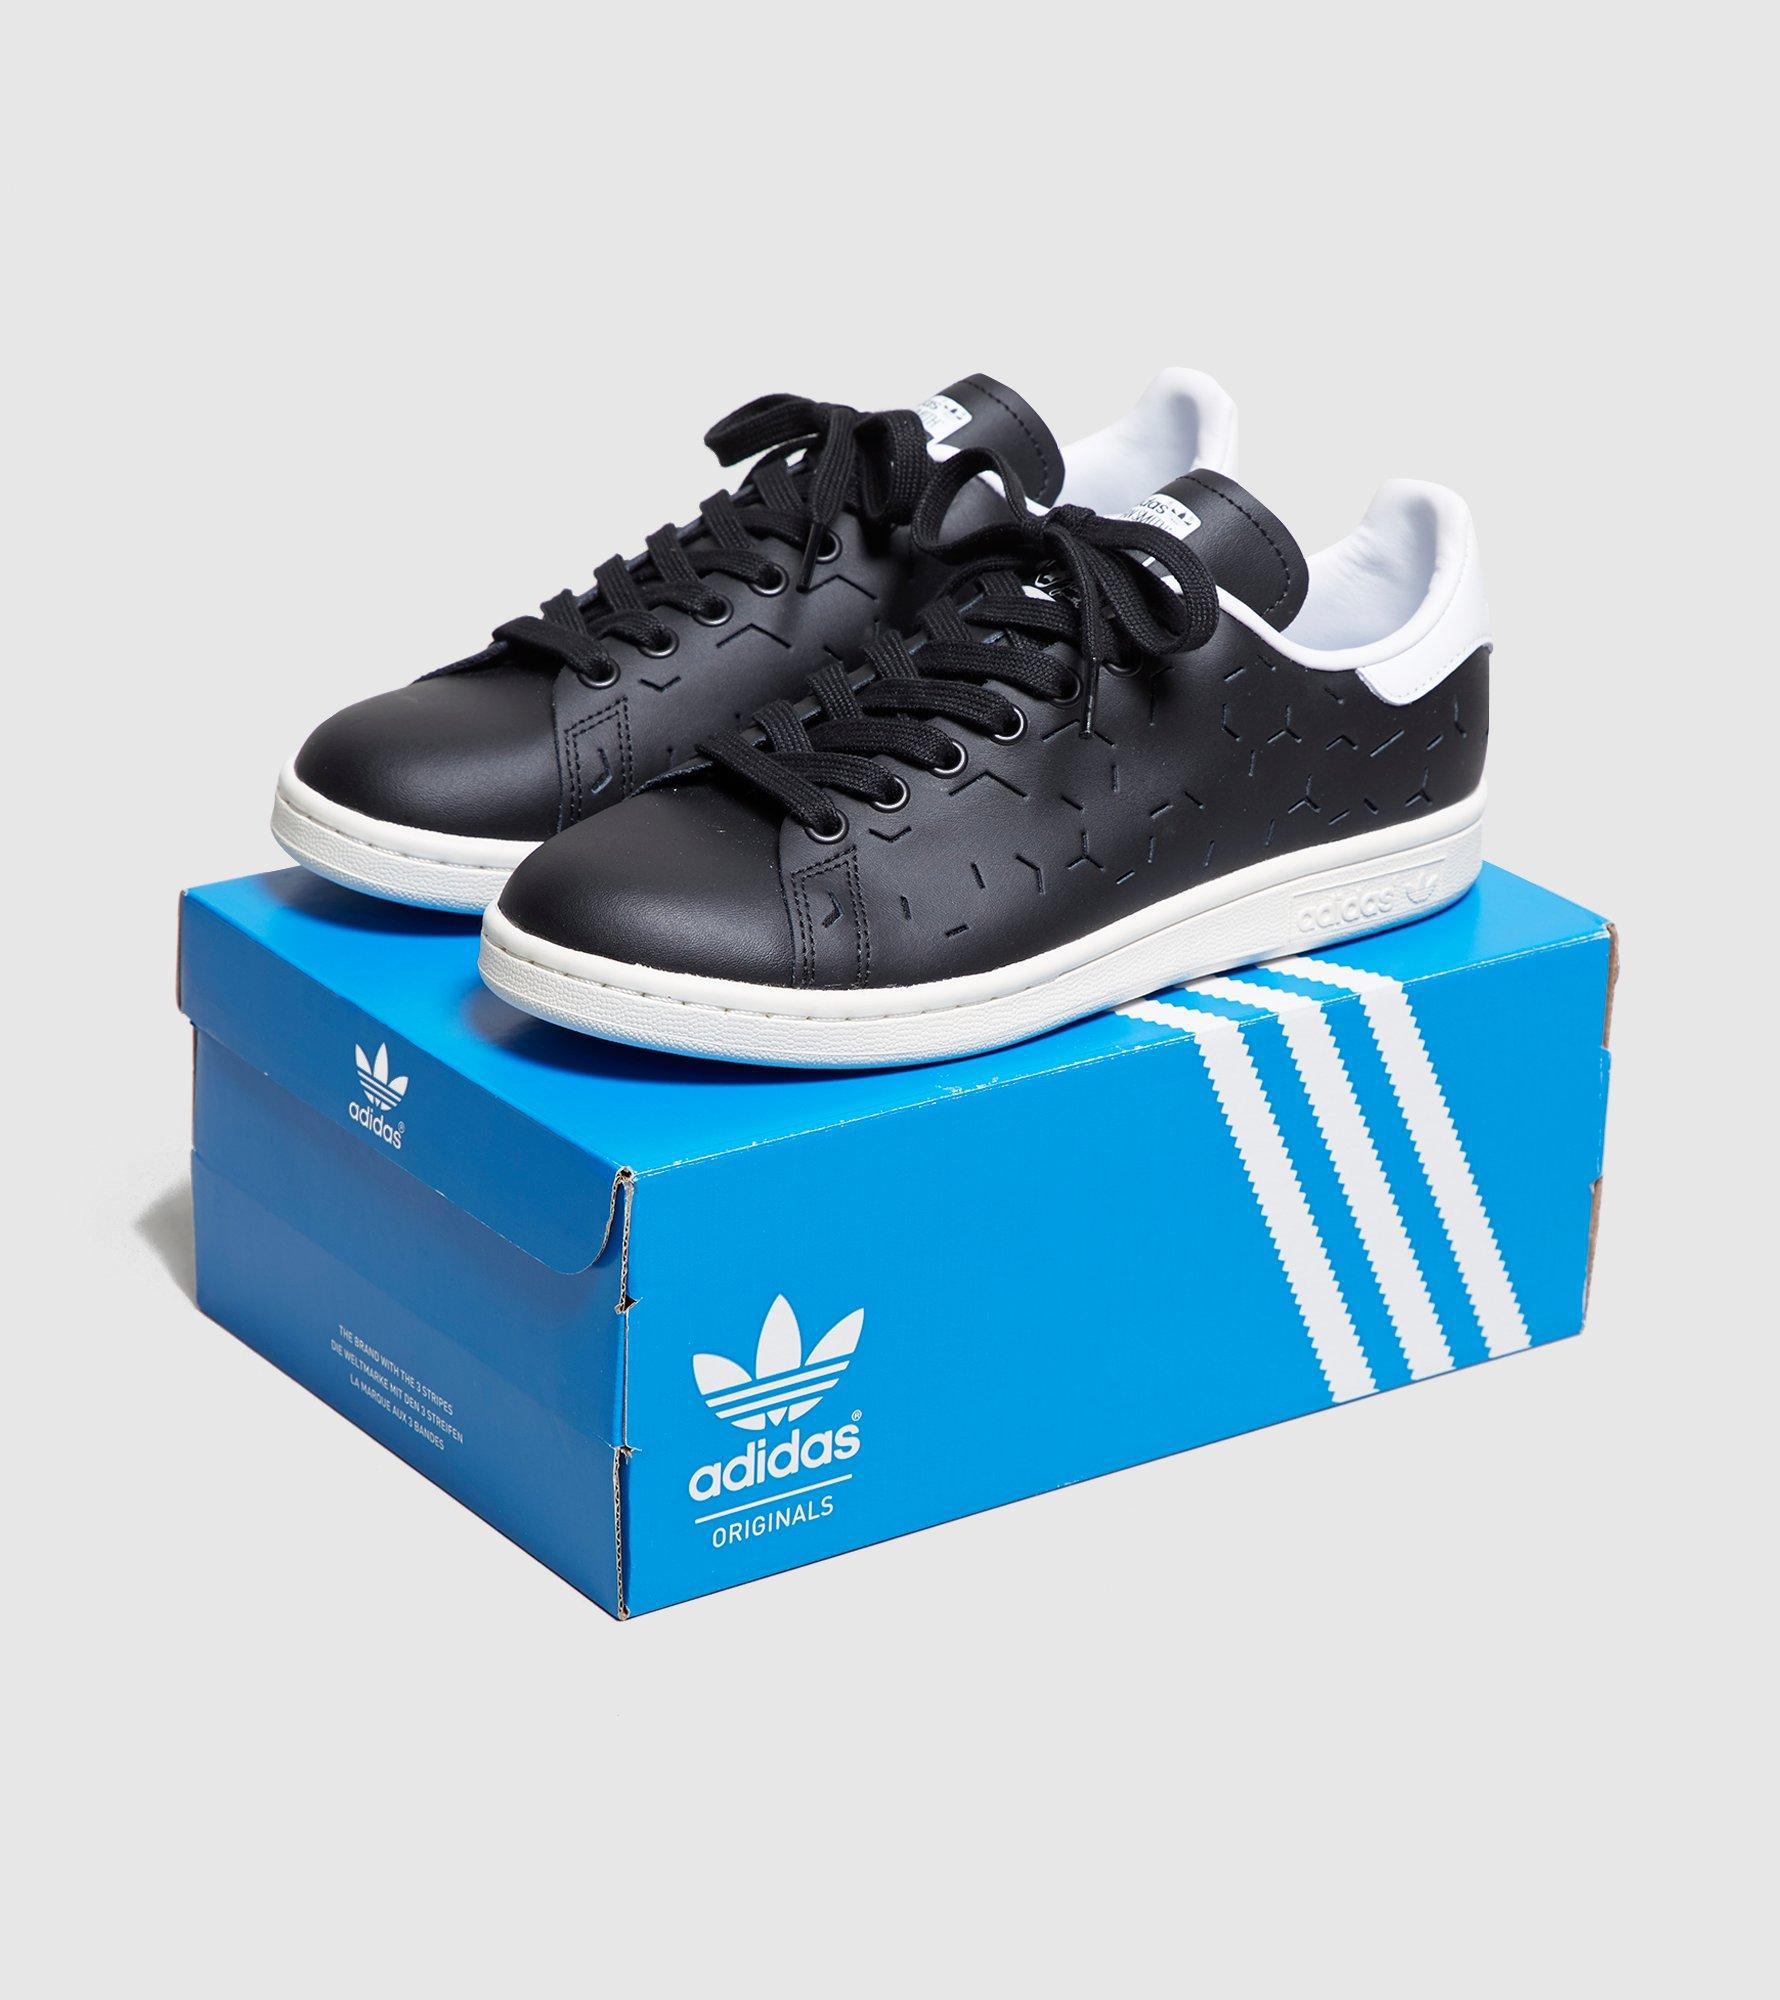 6401f436a5c2e2 ... factory price Adidas Originals - Black Stan Smith Lazer Women s - Lyst.